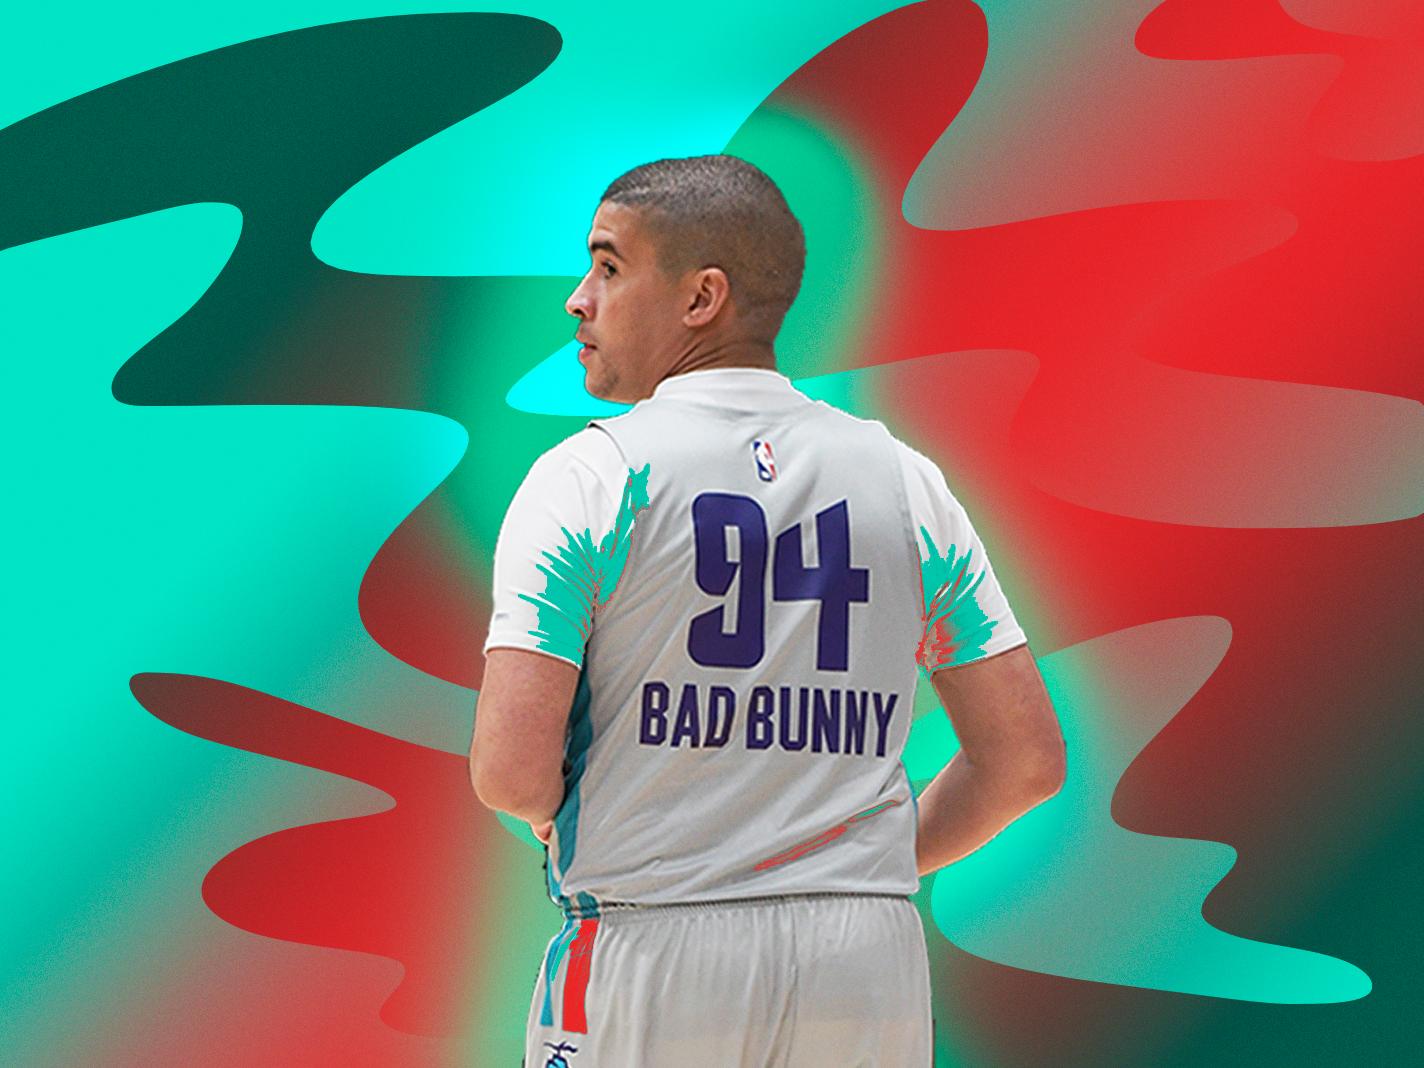 Bad Bunny Announced As New Co-owner of Basketball Team Los Cangrejeros de Santurce